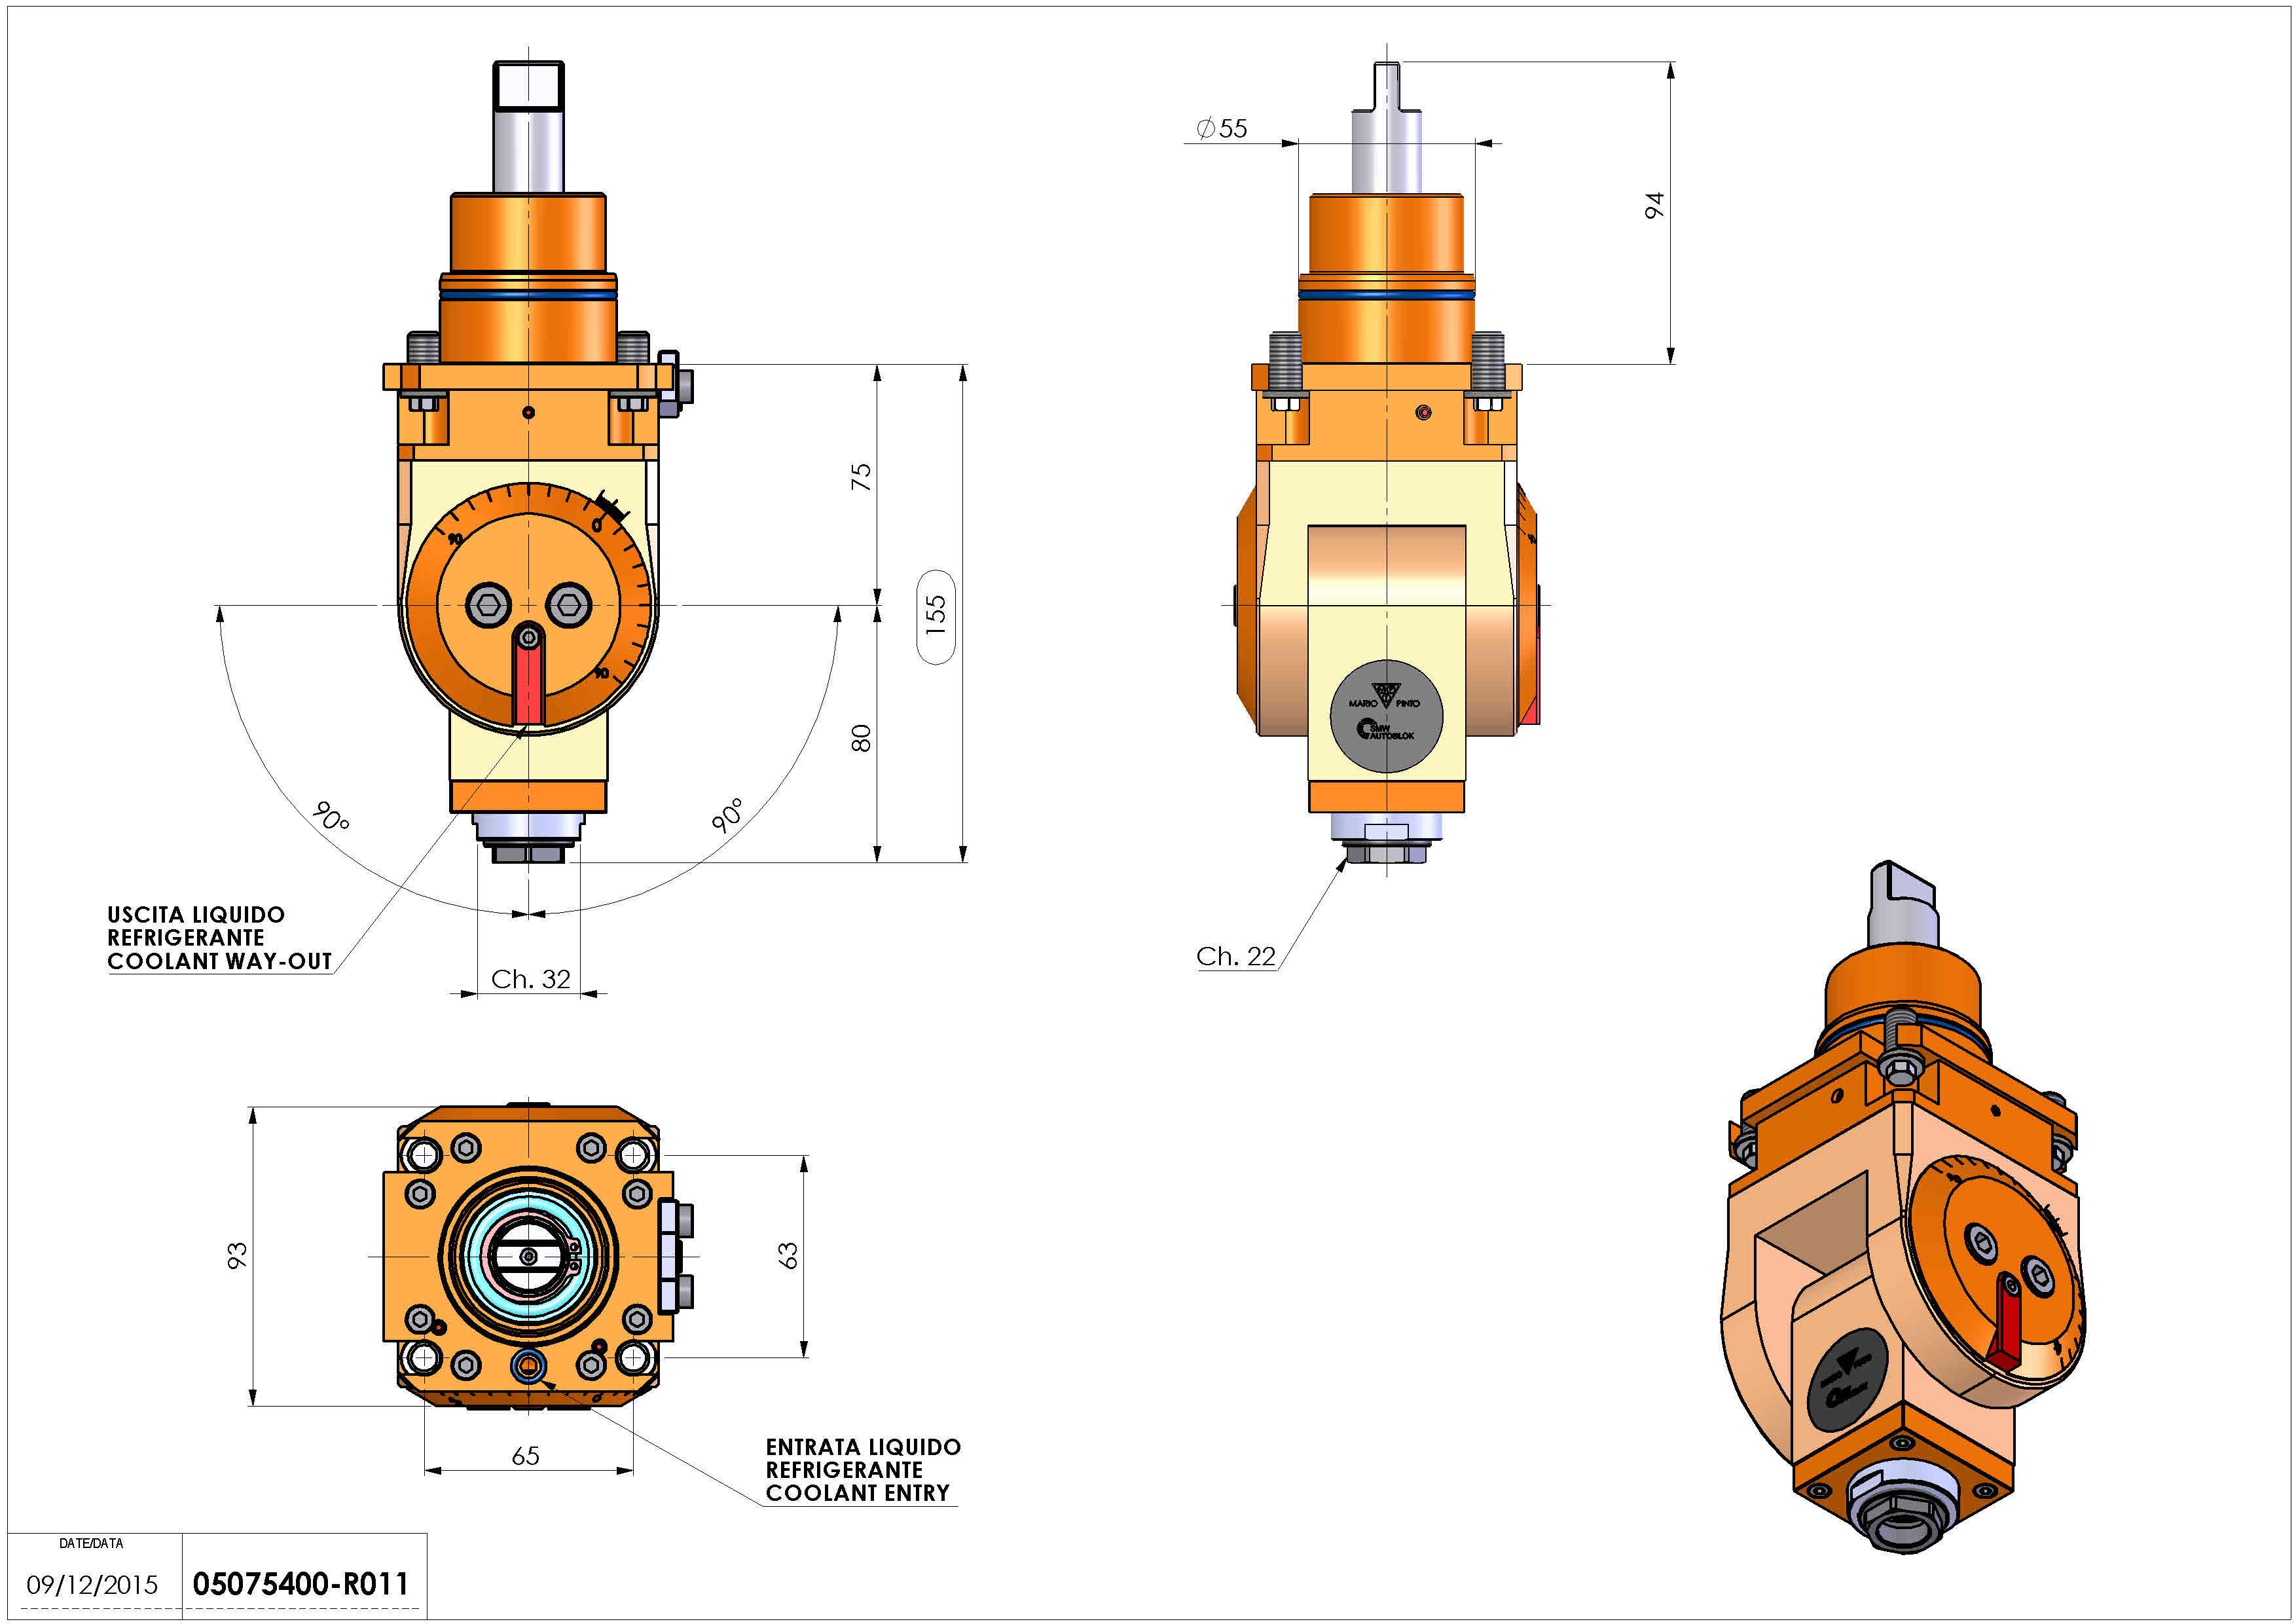 Technical image - LT-T D55 ER20F H75-155 BI.